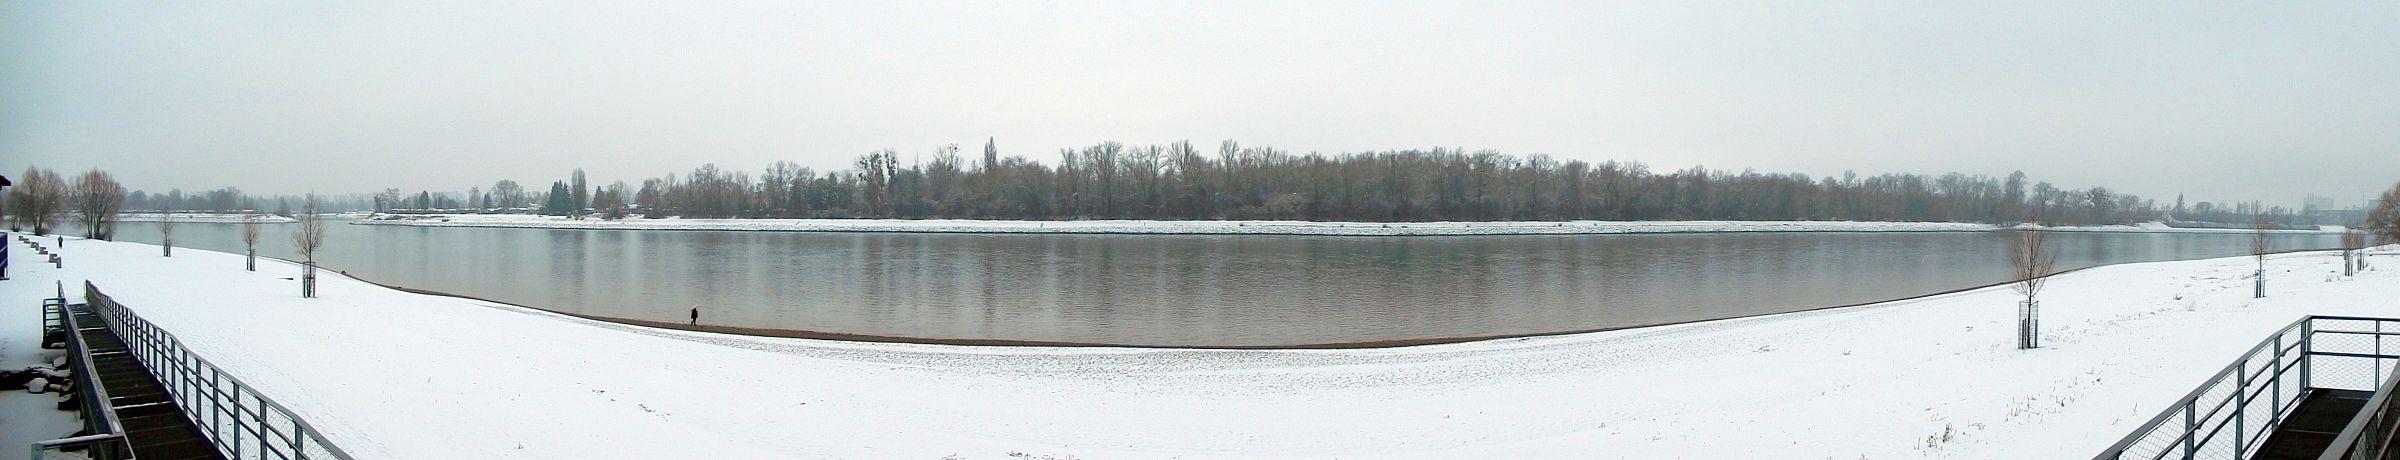 Strandbad Mannheim